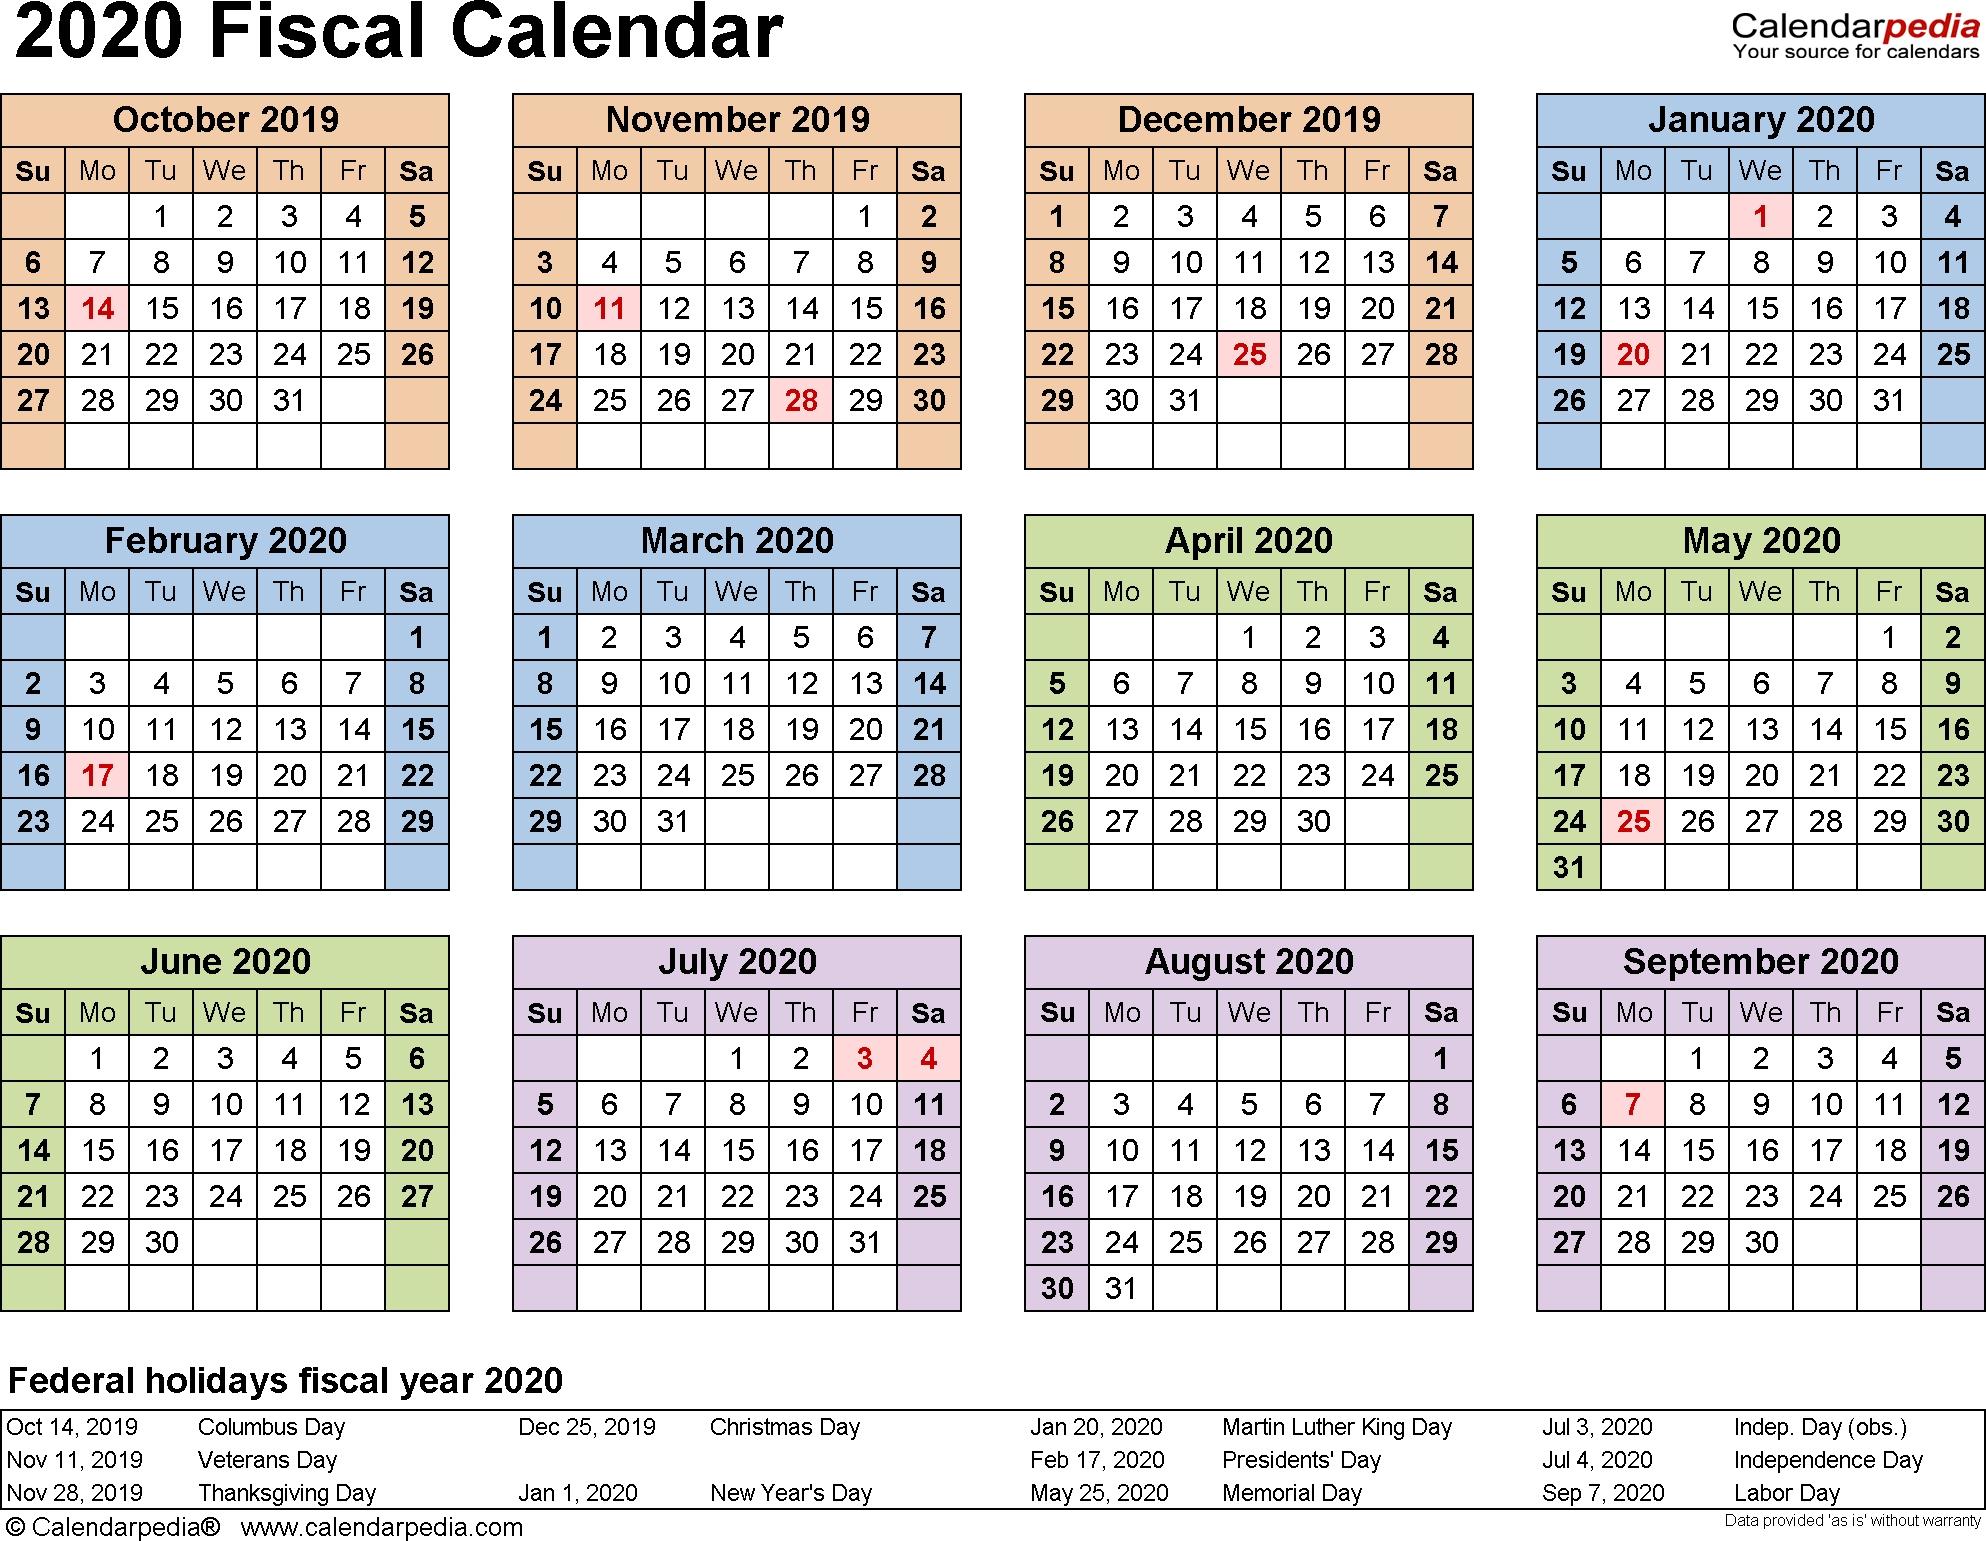 Fiscal Calendars 2020 As Free Printable Pdf Templates regarding Financial Week Calendar 2019/2020